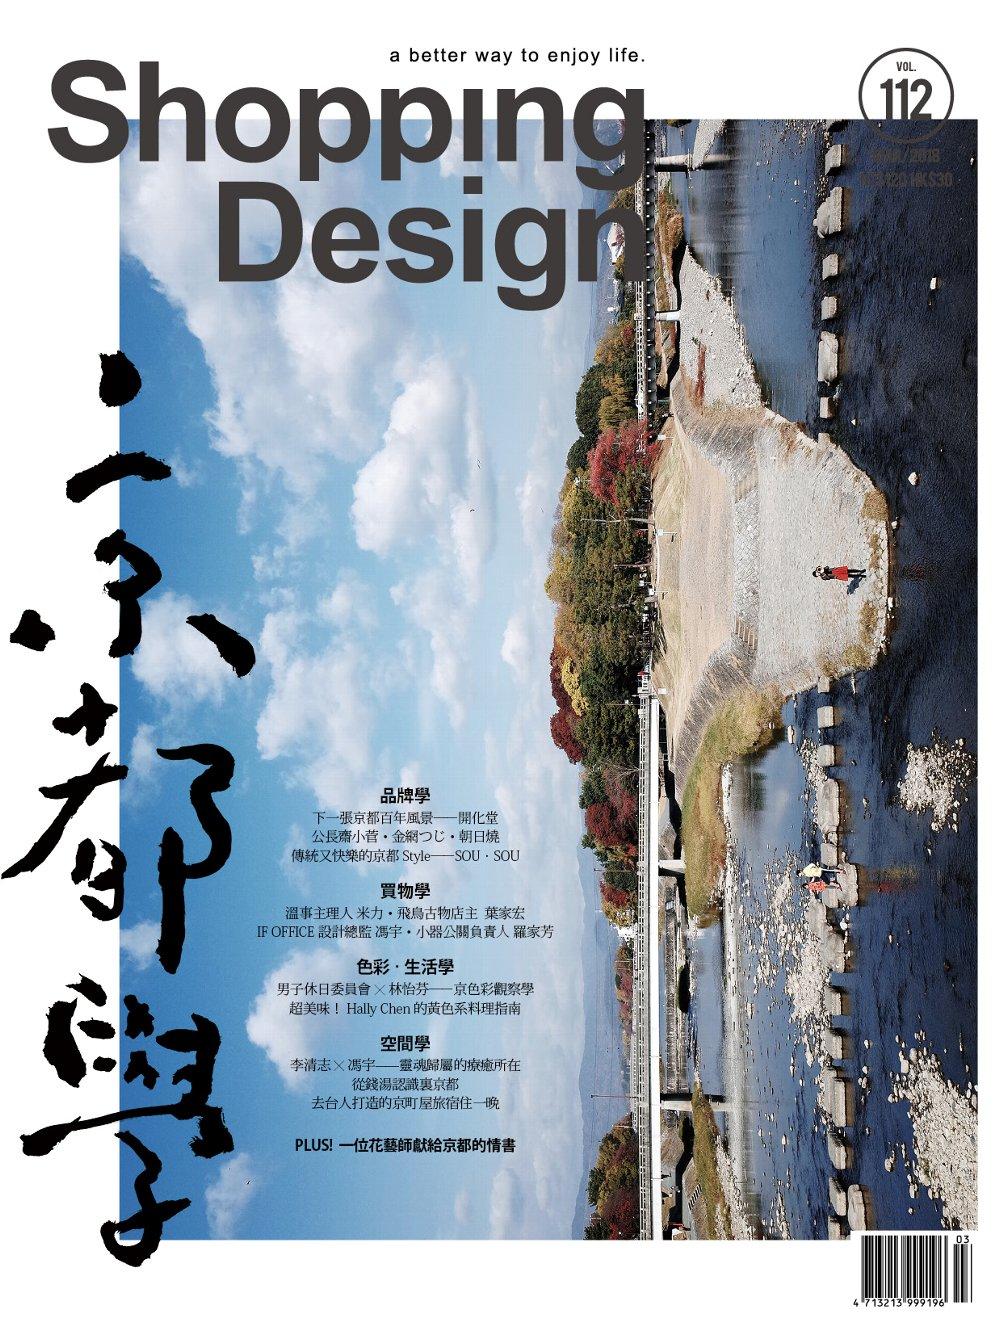 Shopping Design設計採買誌一年12期 +Shopping Design新刊3期